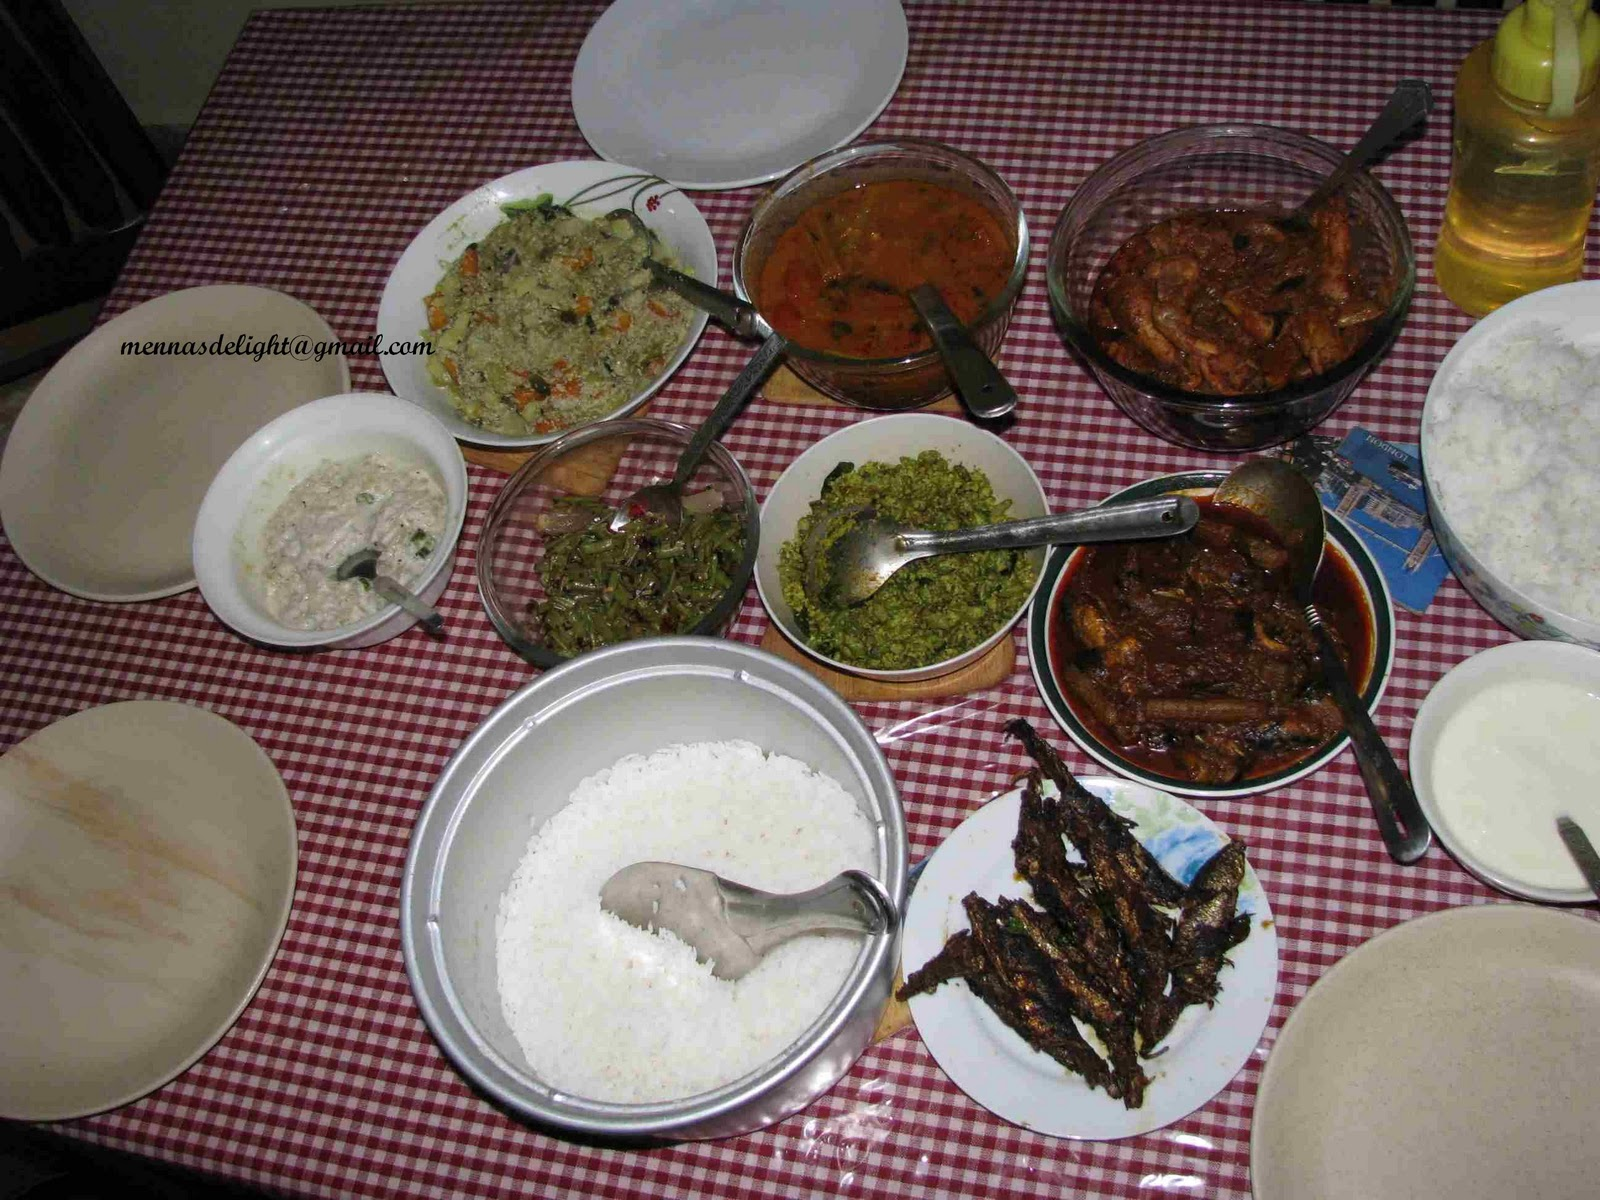 Kerala Recipes and Kerala Dishes